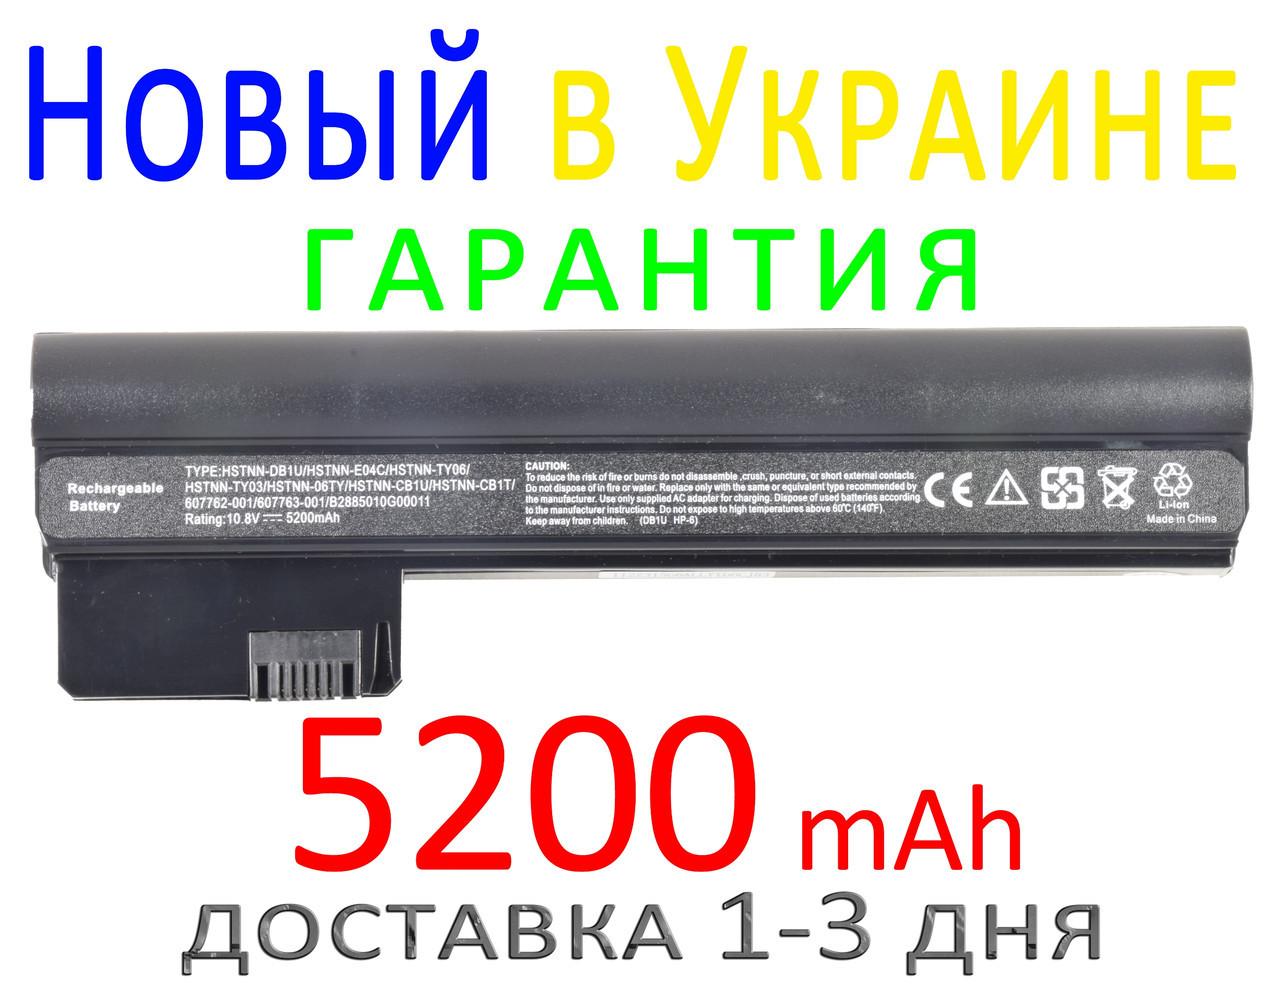 Аккумулятор батарея HP Mini 110 3101 3102 3103 3104 EA EG SA SG TU